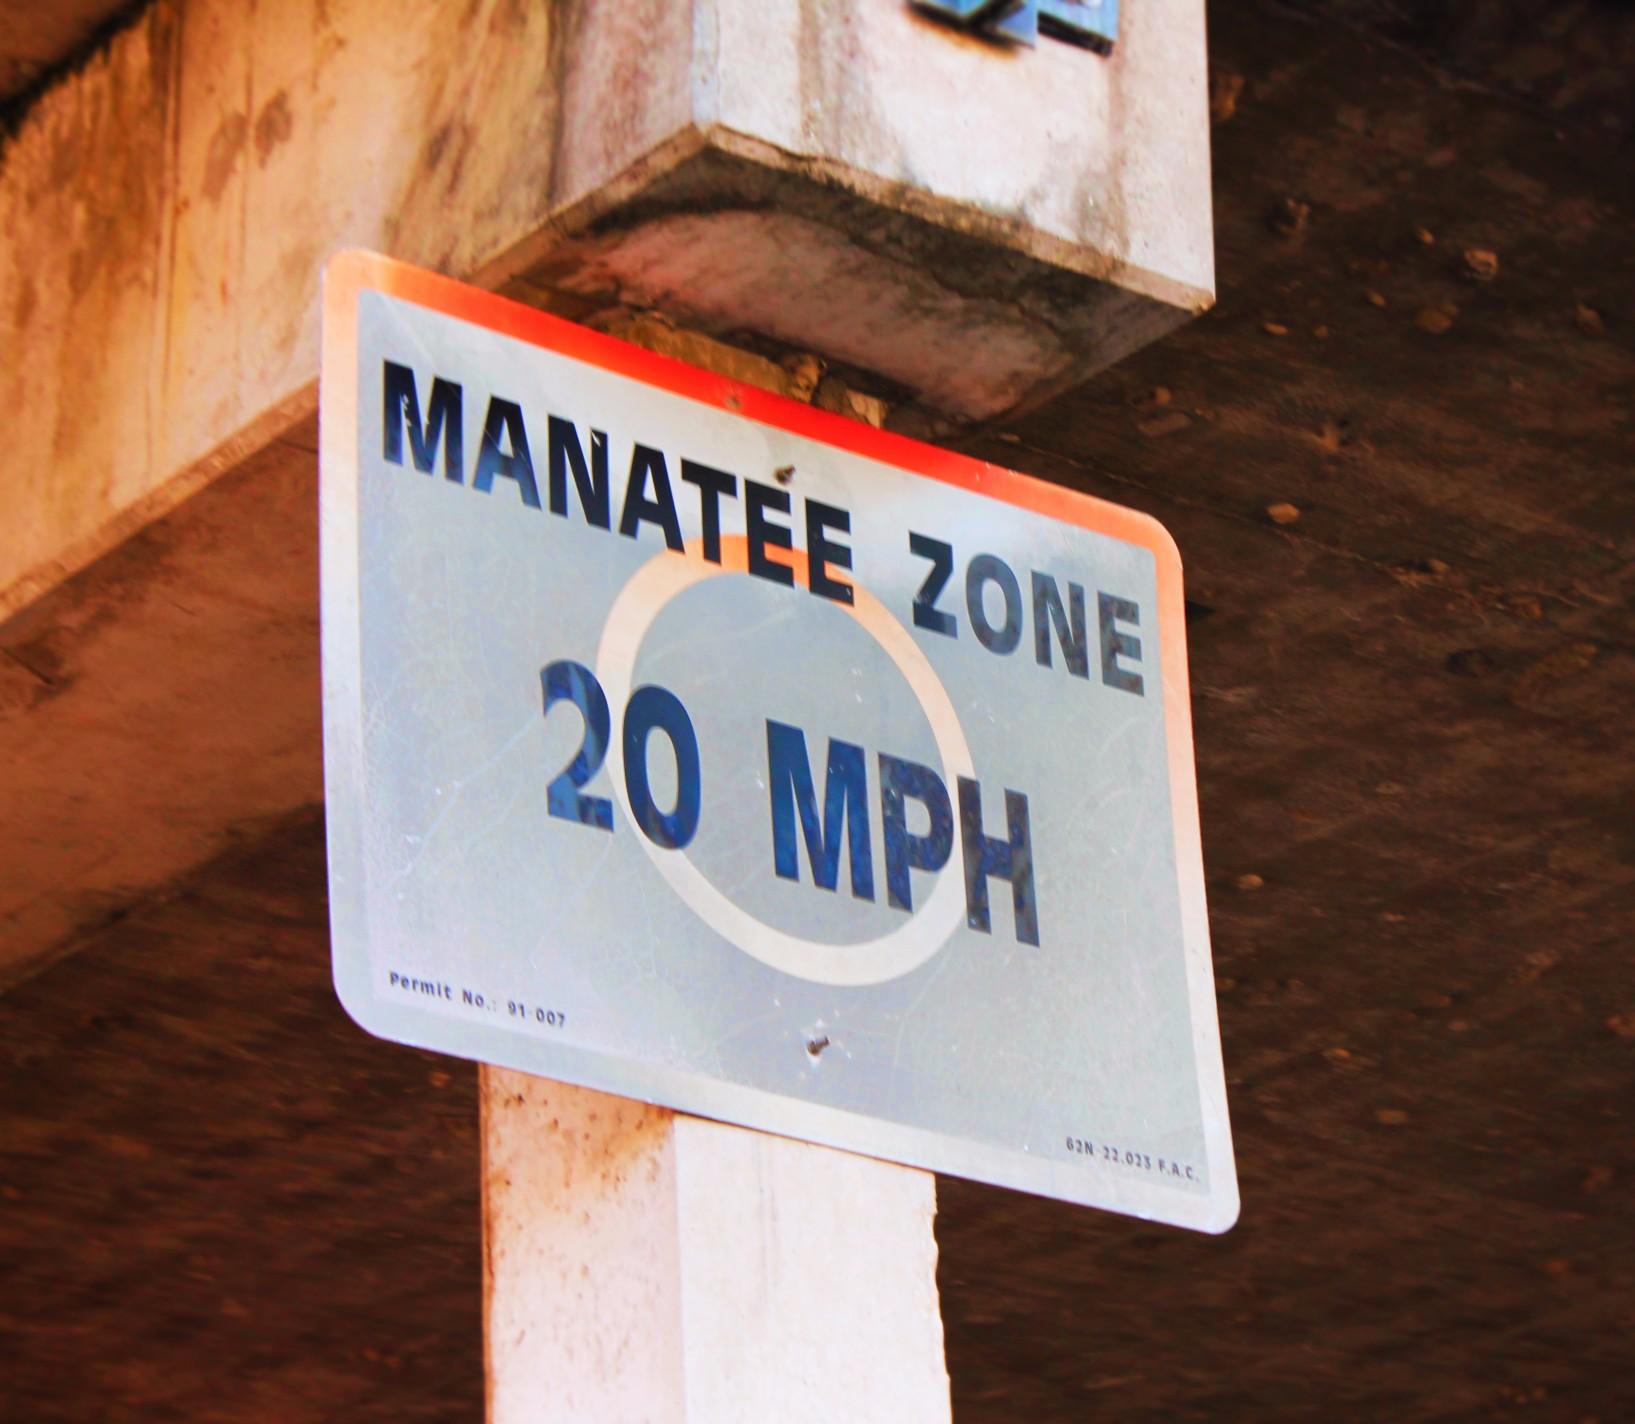 Manatee-Zone-Speed-Sign-Everglades-City-Florida-1.jpg